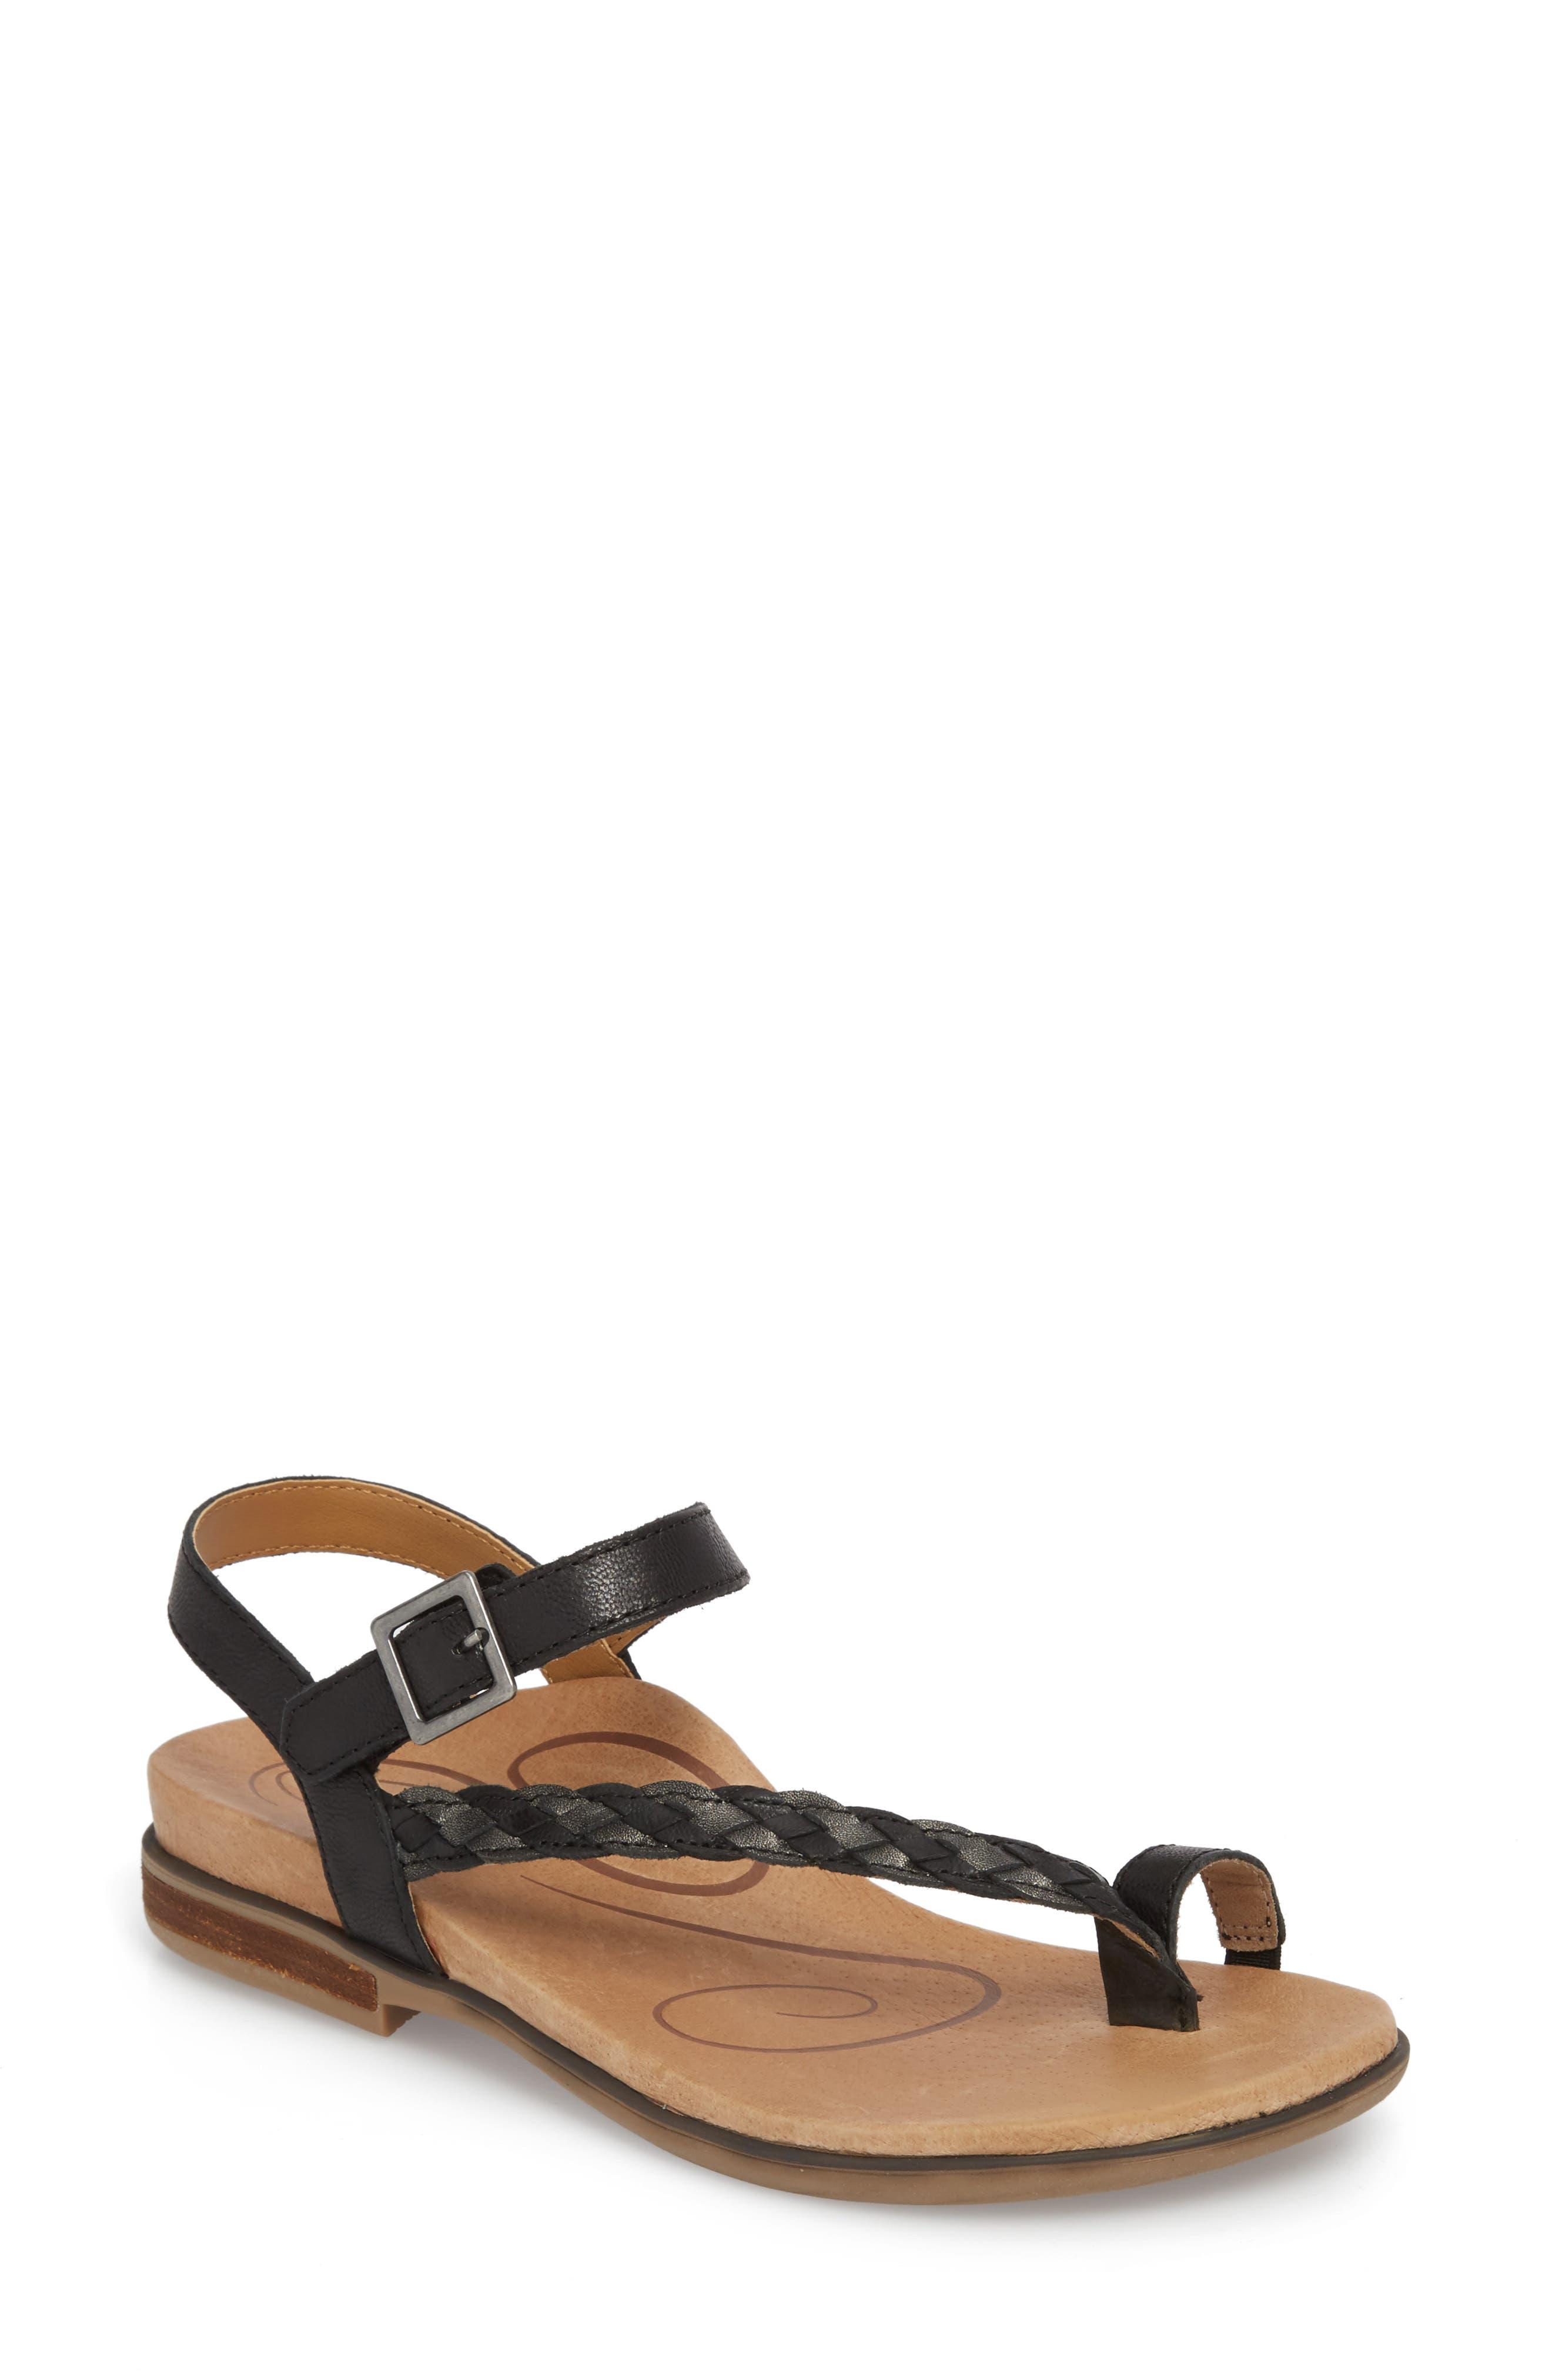 Evie Braided Strap Sandal,                         Main,                         color, BLACK LEATHER